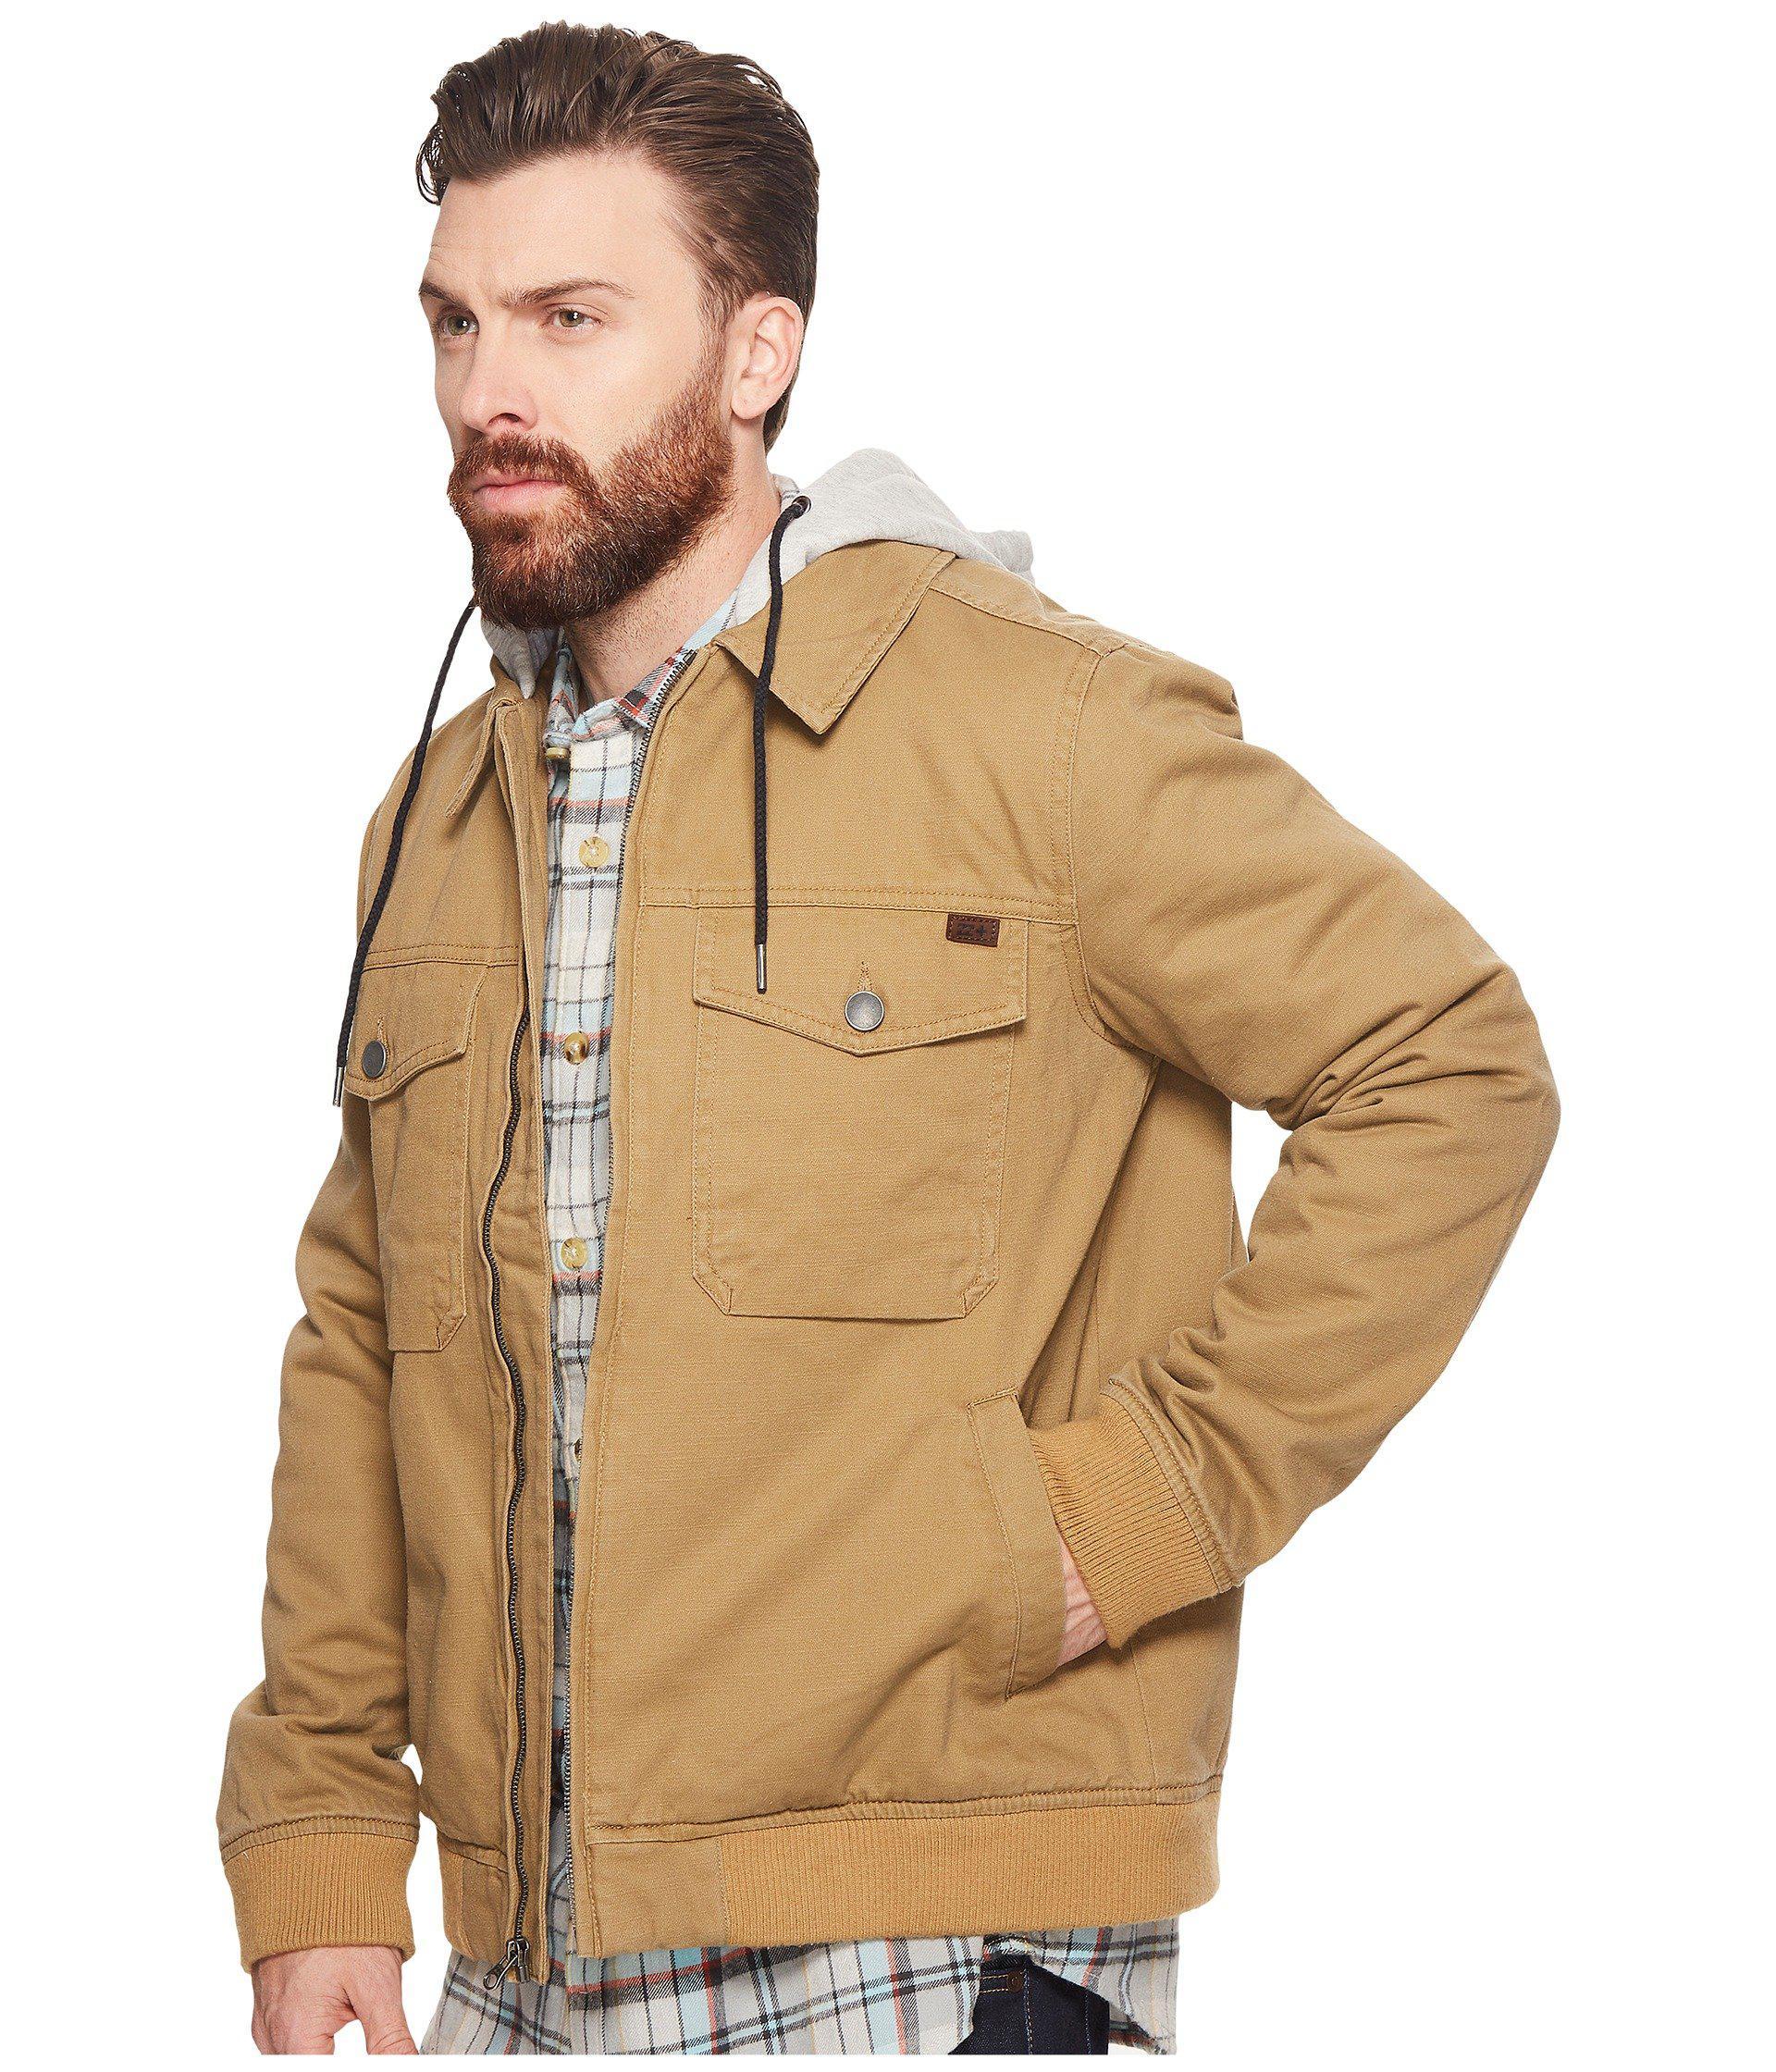 206f9e8aa Men's Barlow Twill Jacket